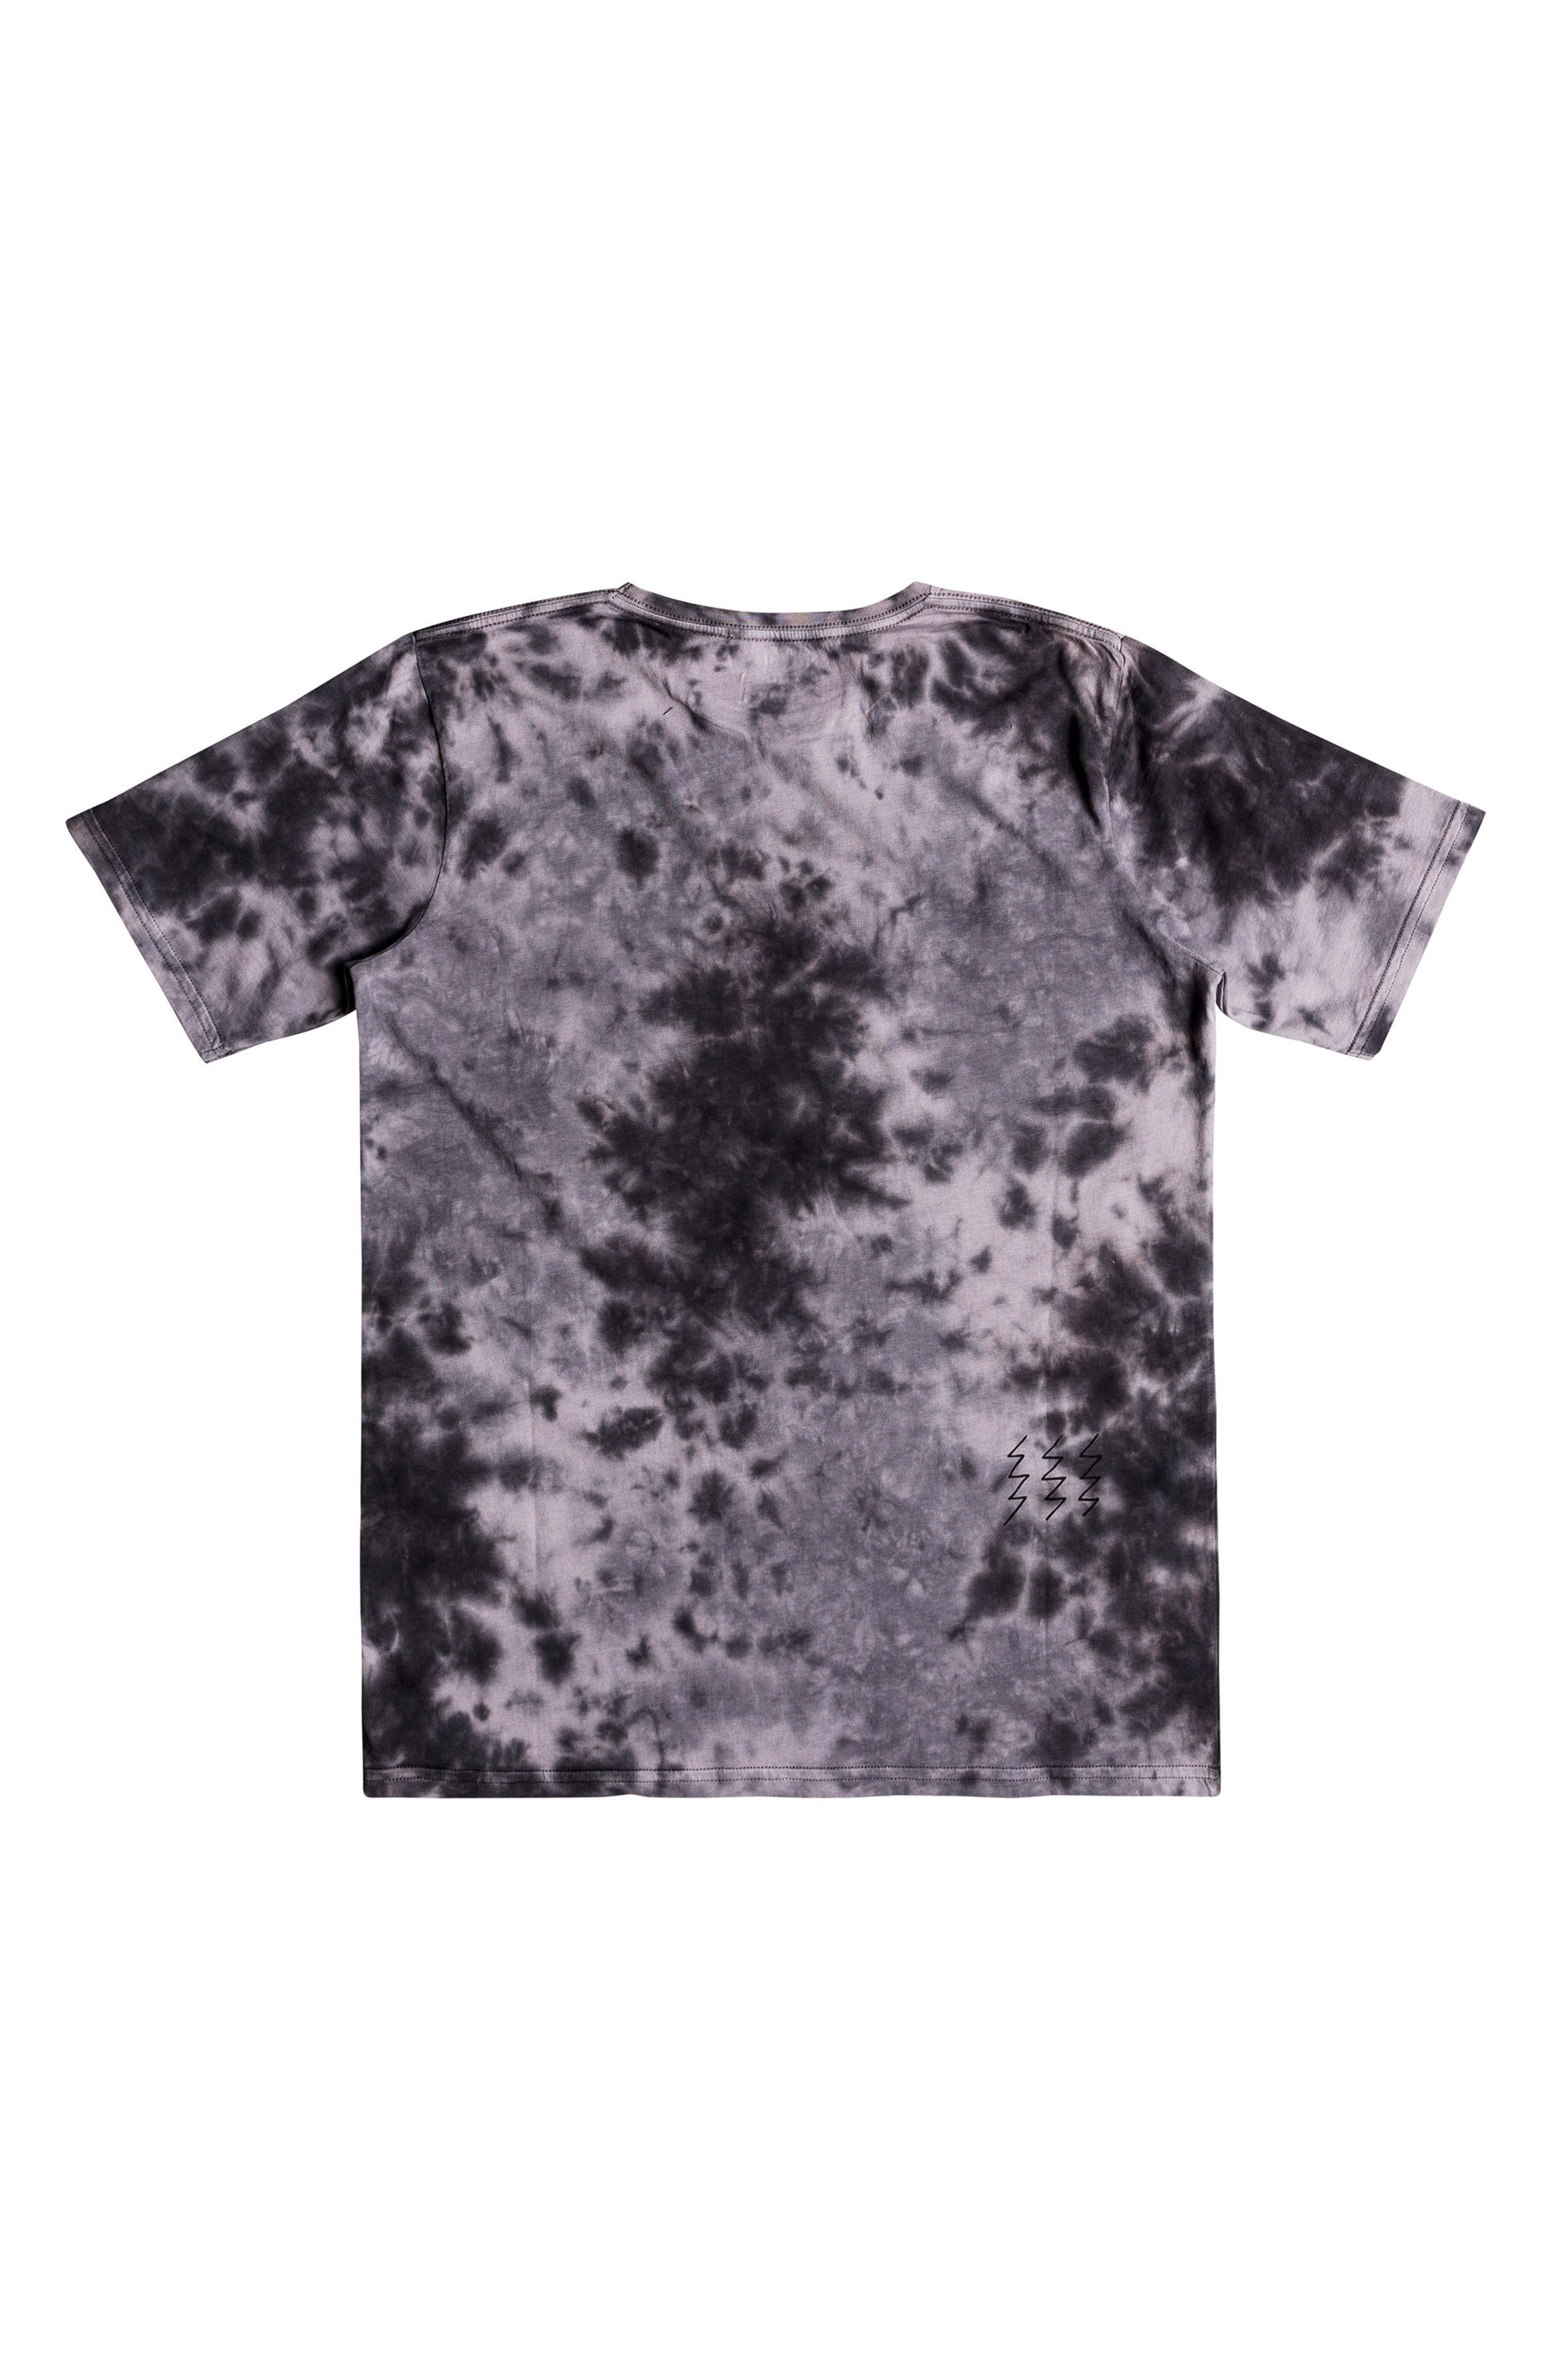 Gibus Moon Graphic T-Shirt,                             Alternate thumbnail 2, color,                             Iron Gate Tie Dye